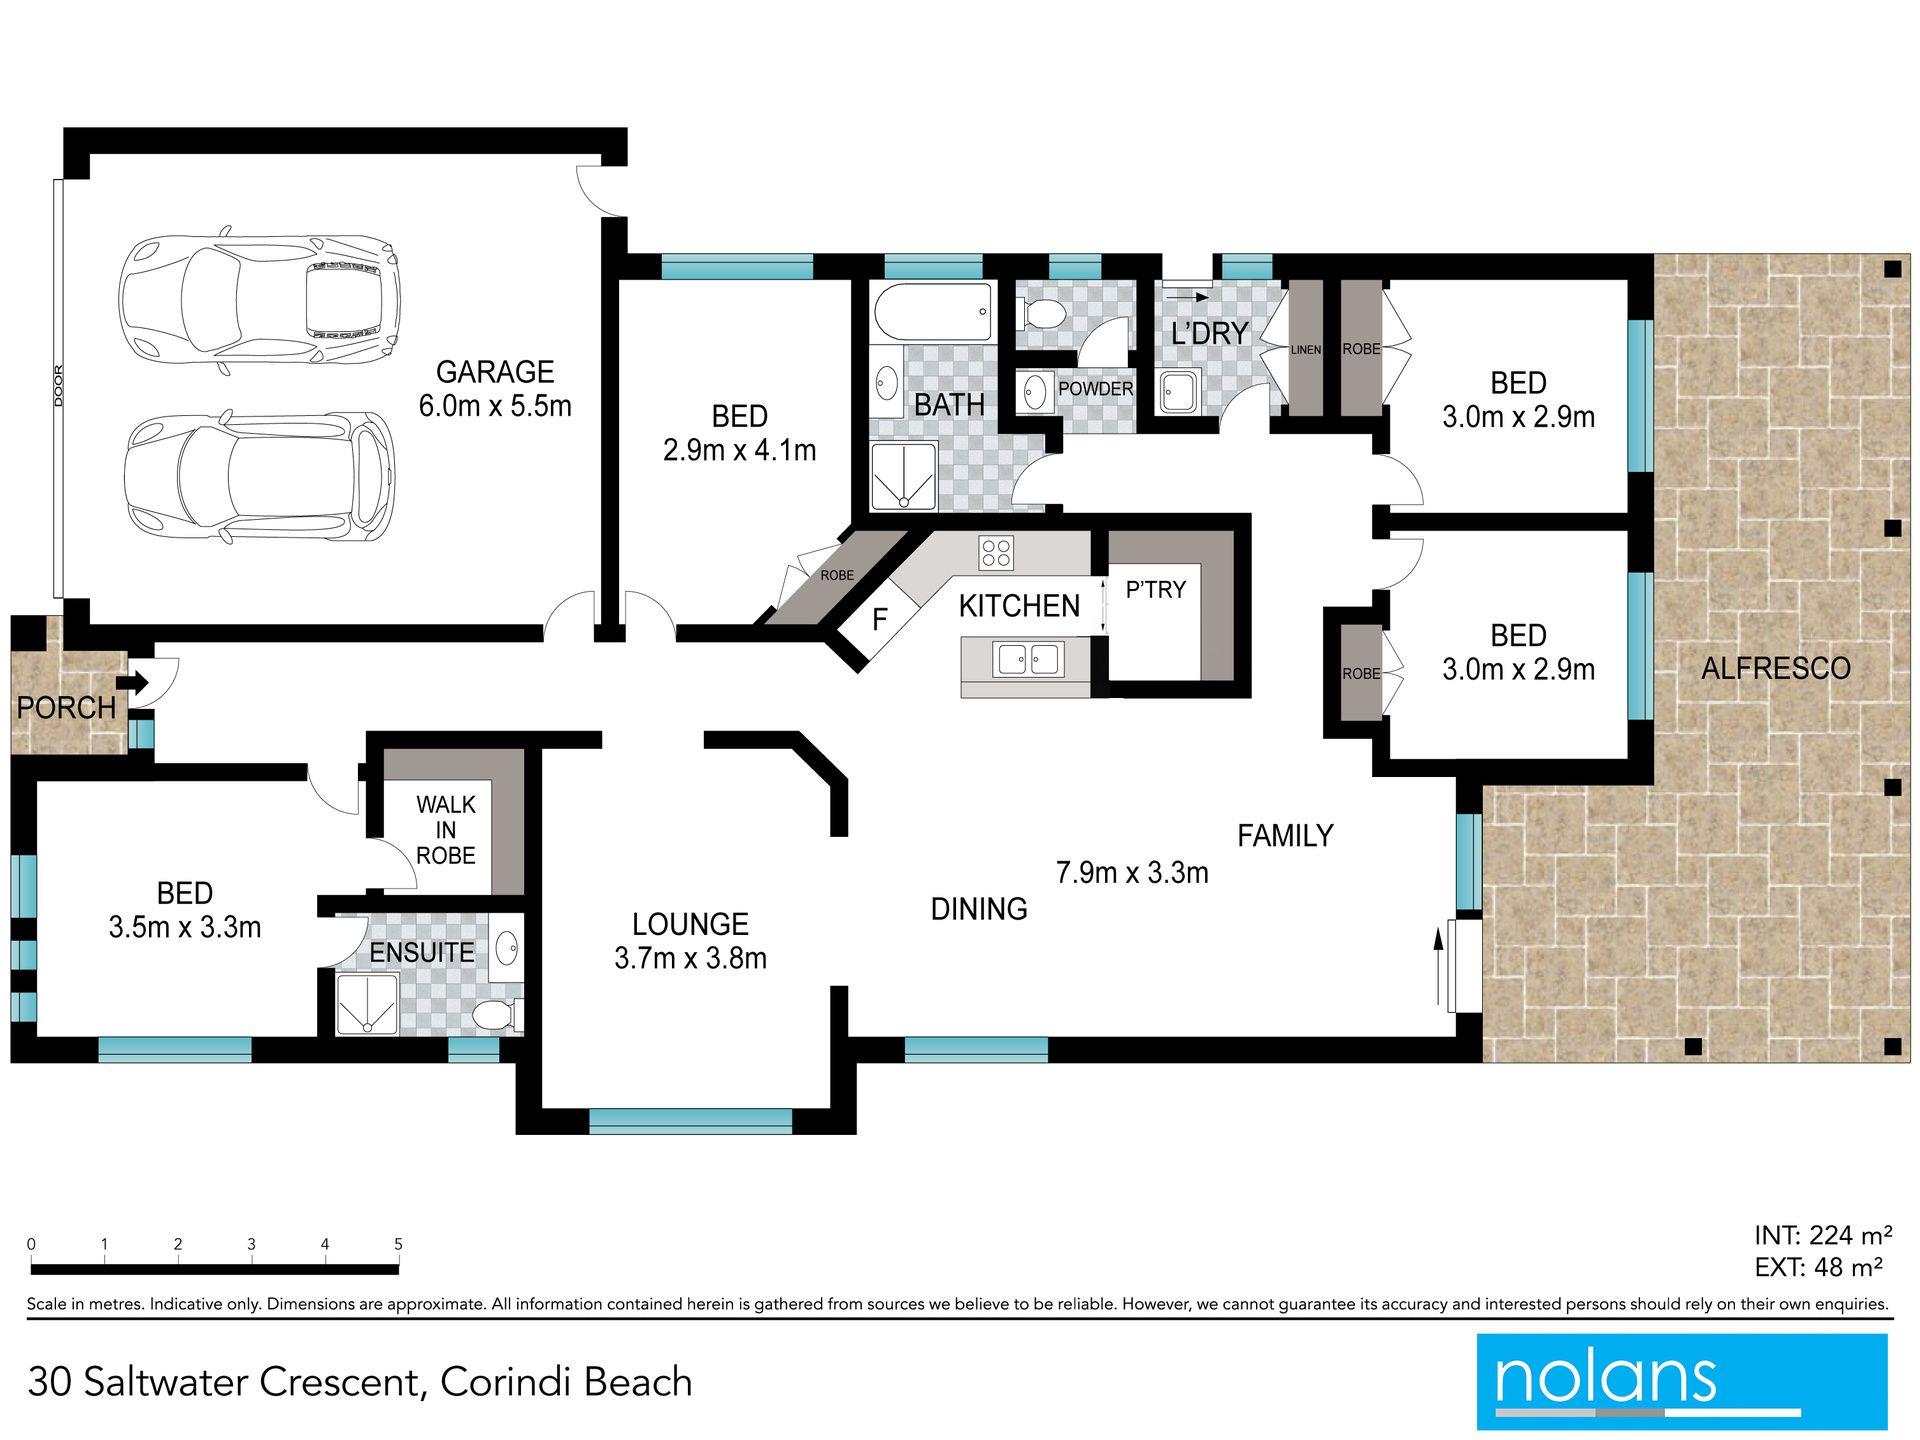 Real Estate For Sale 30 Saltwater Crescent Corindi Beach Nsw Salt Water Diagram Floor Plan